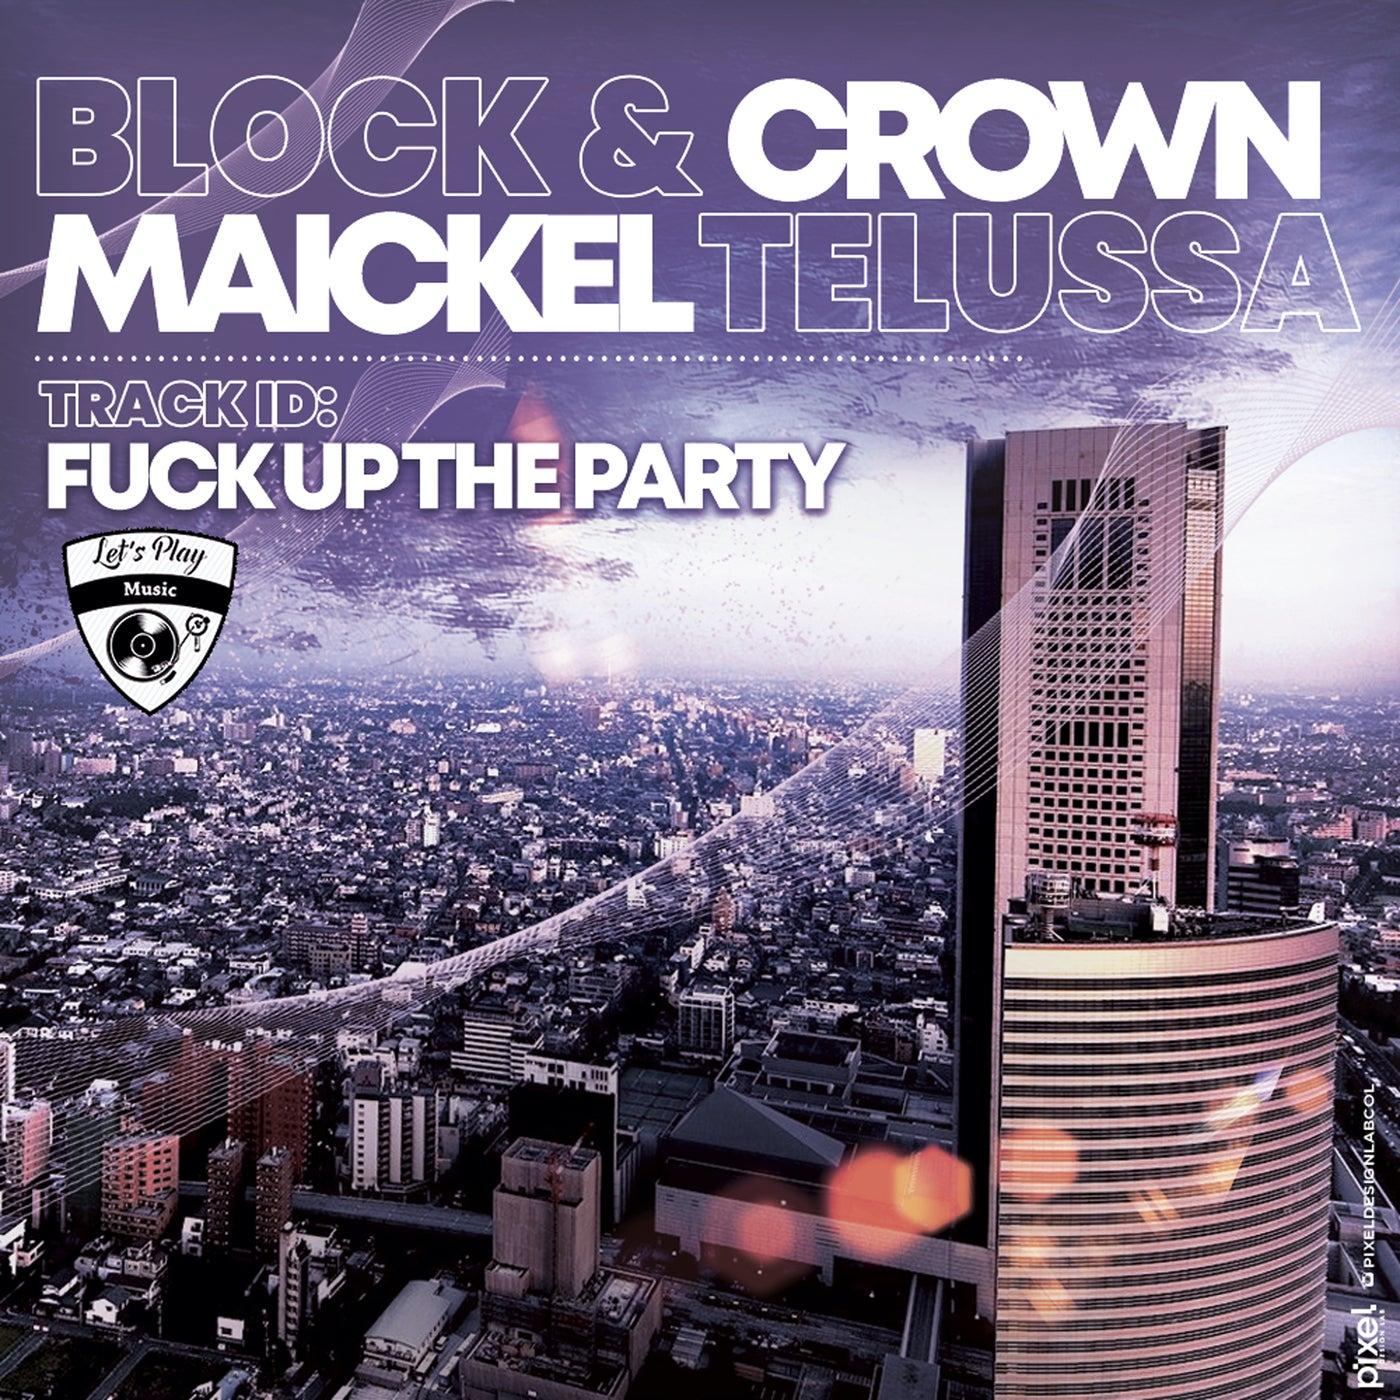 Fuck up the Party (Original Mix)